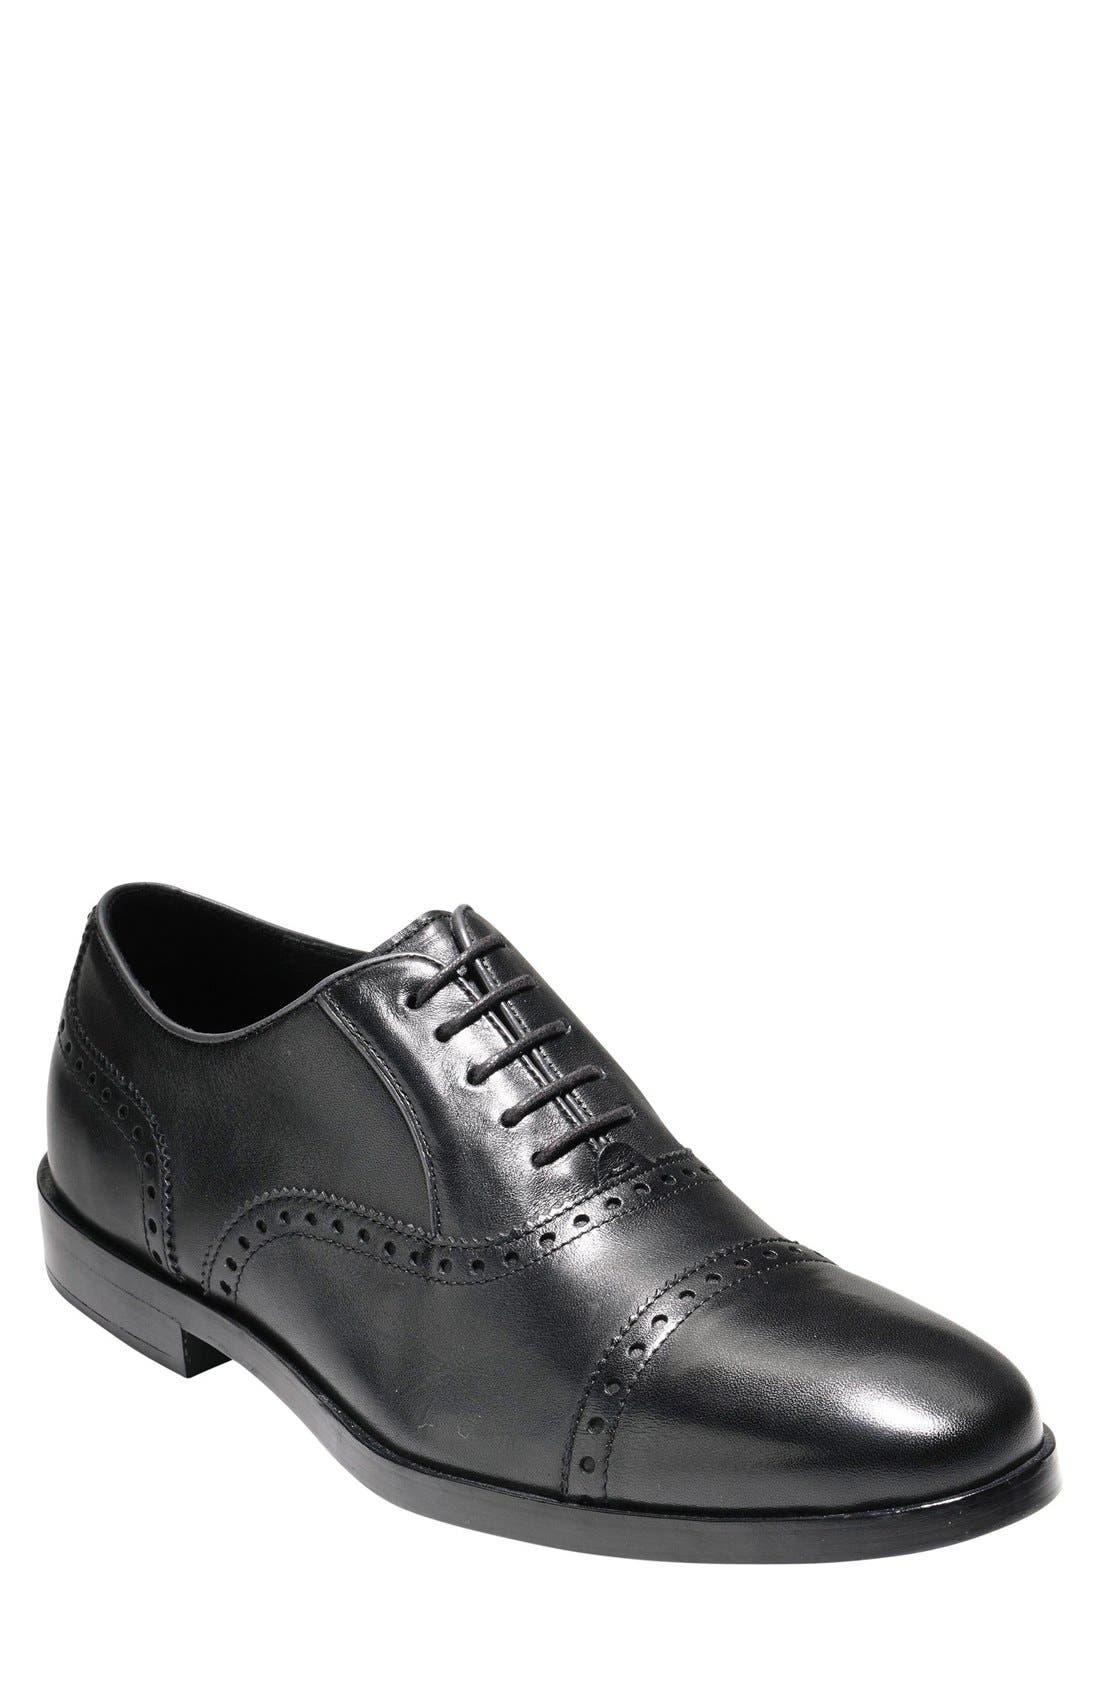 COLE HAAN 'Hamilton' Cap Toe Oxford, Main, color, BLACK LEATHER